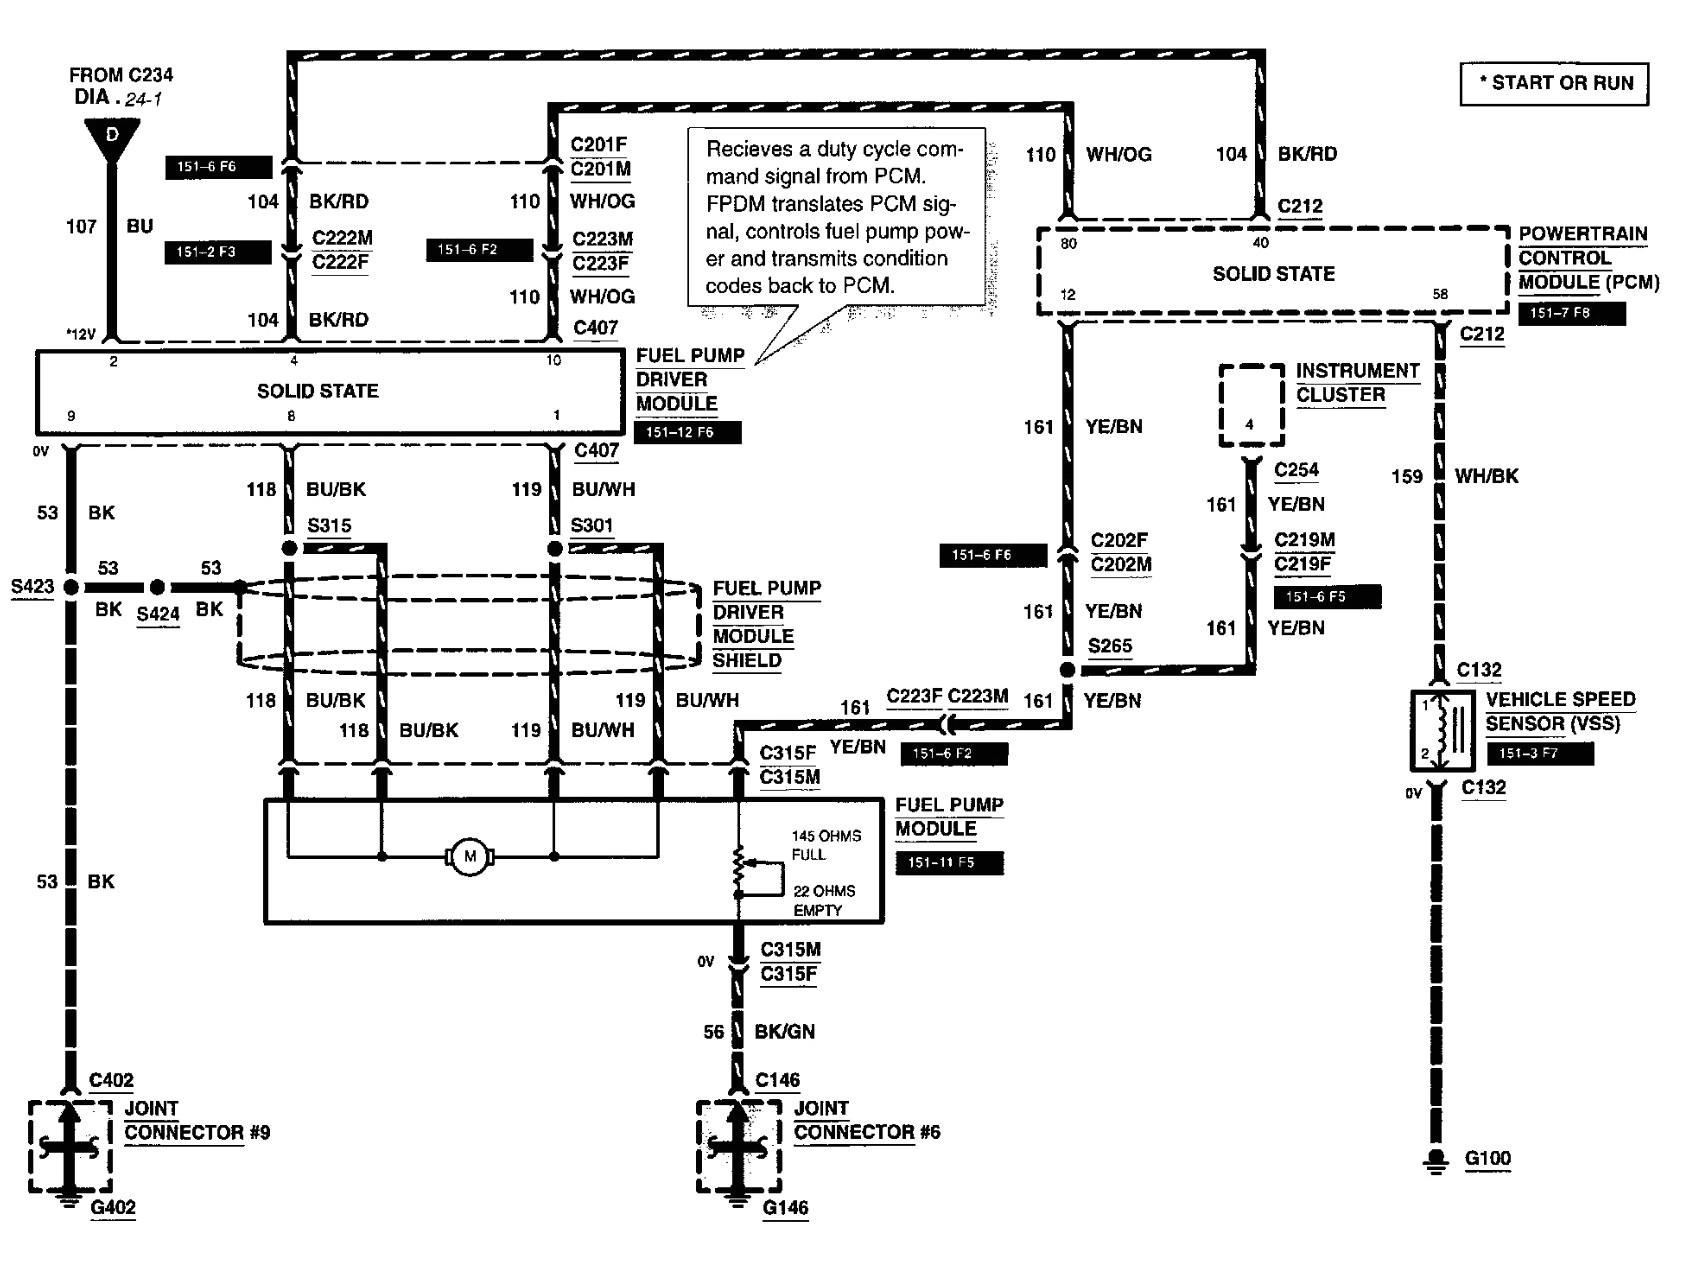 99 ford escort wiring diagram best of 1993 ford escort wiring diagram copy wiring diagrams e